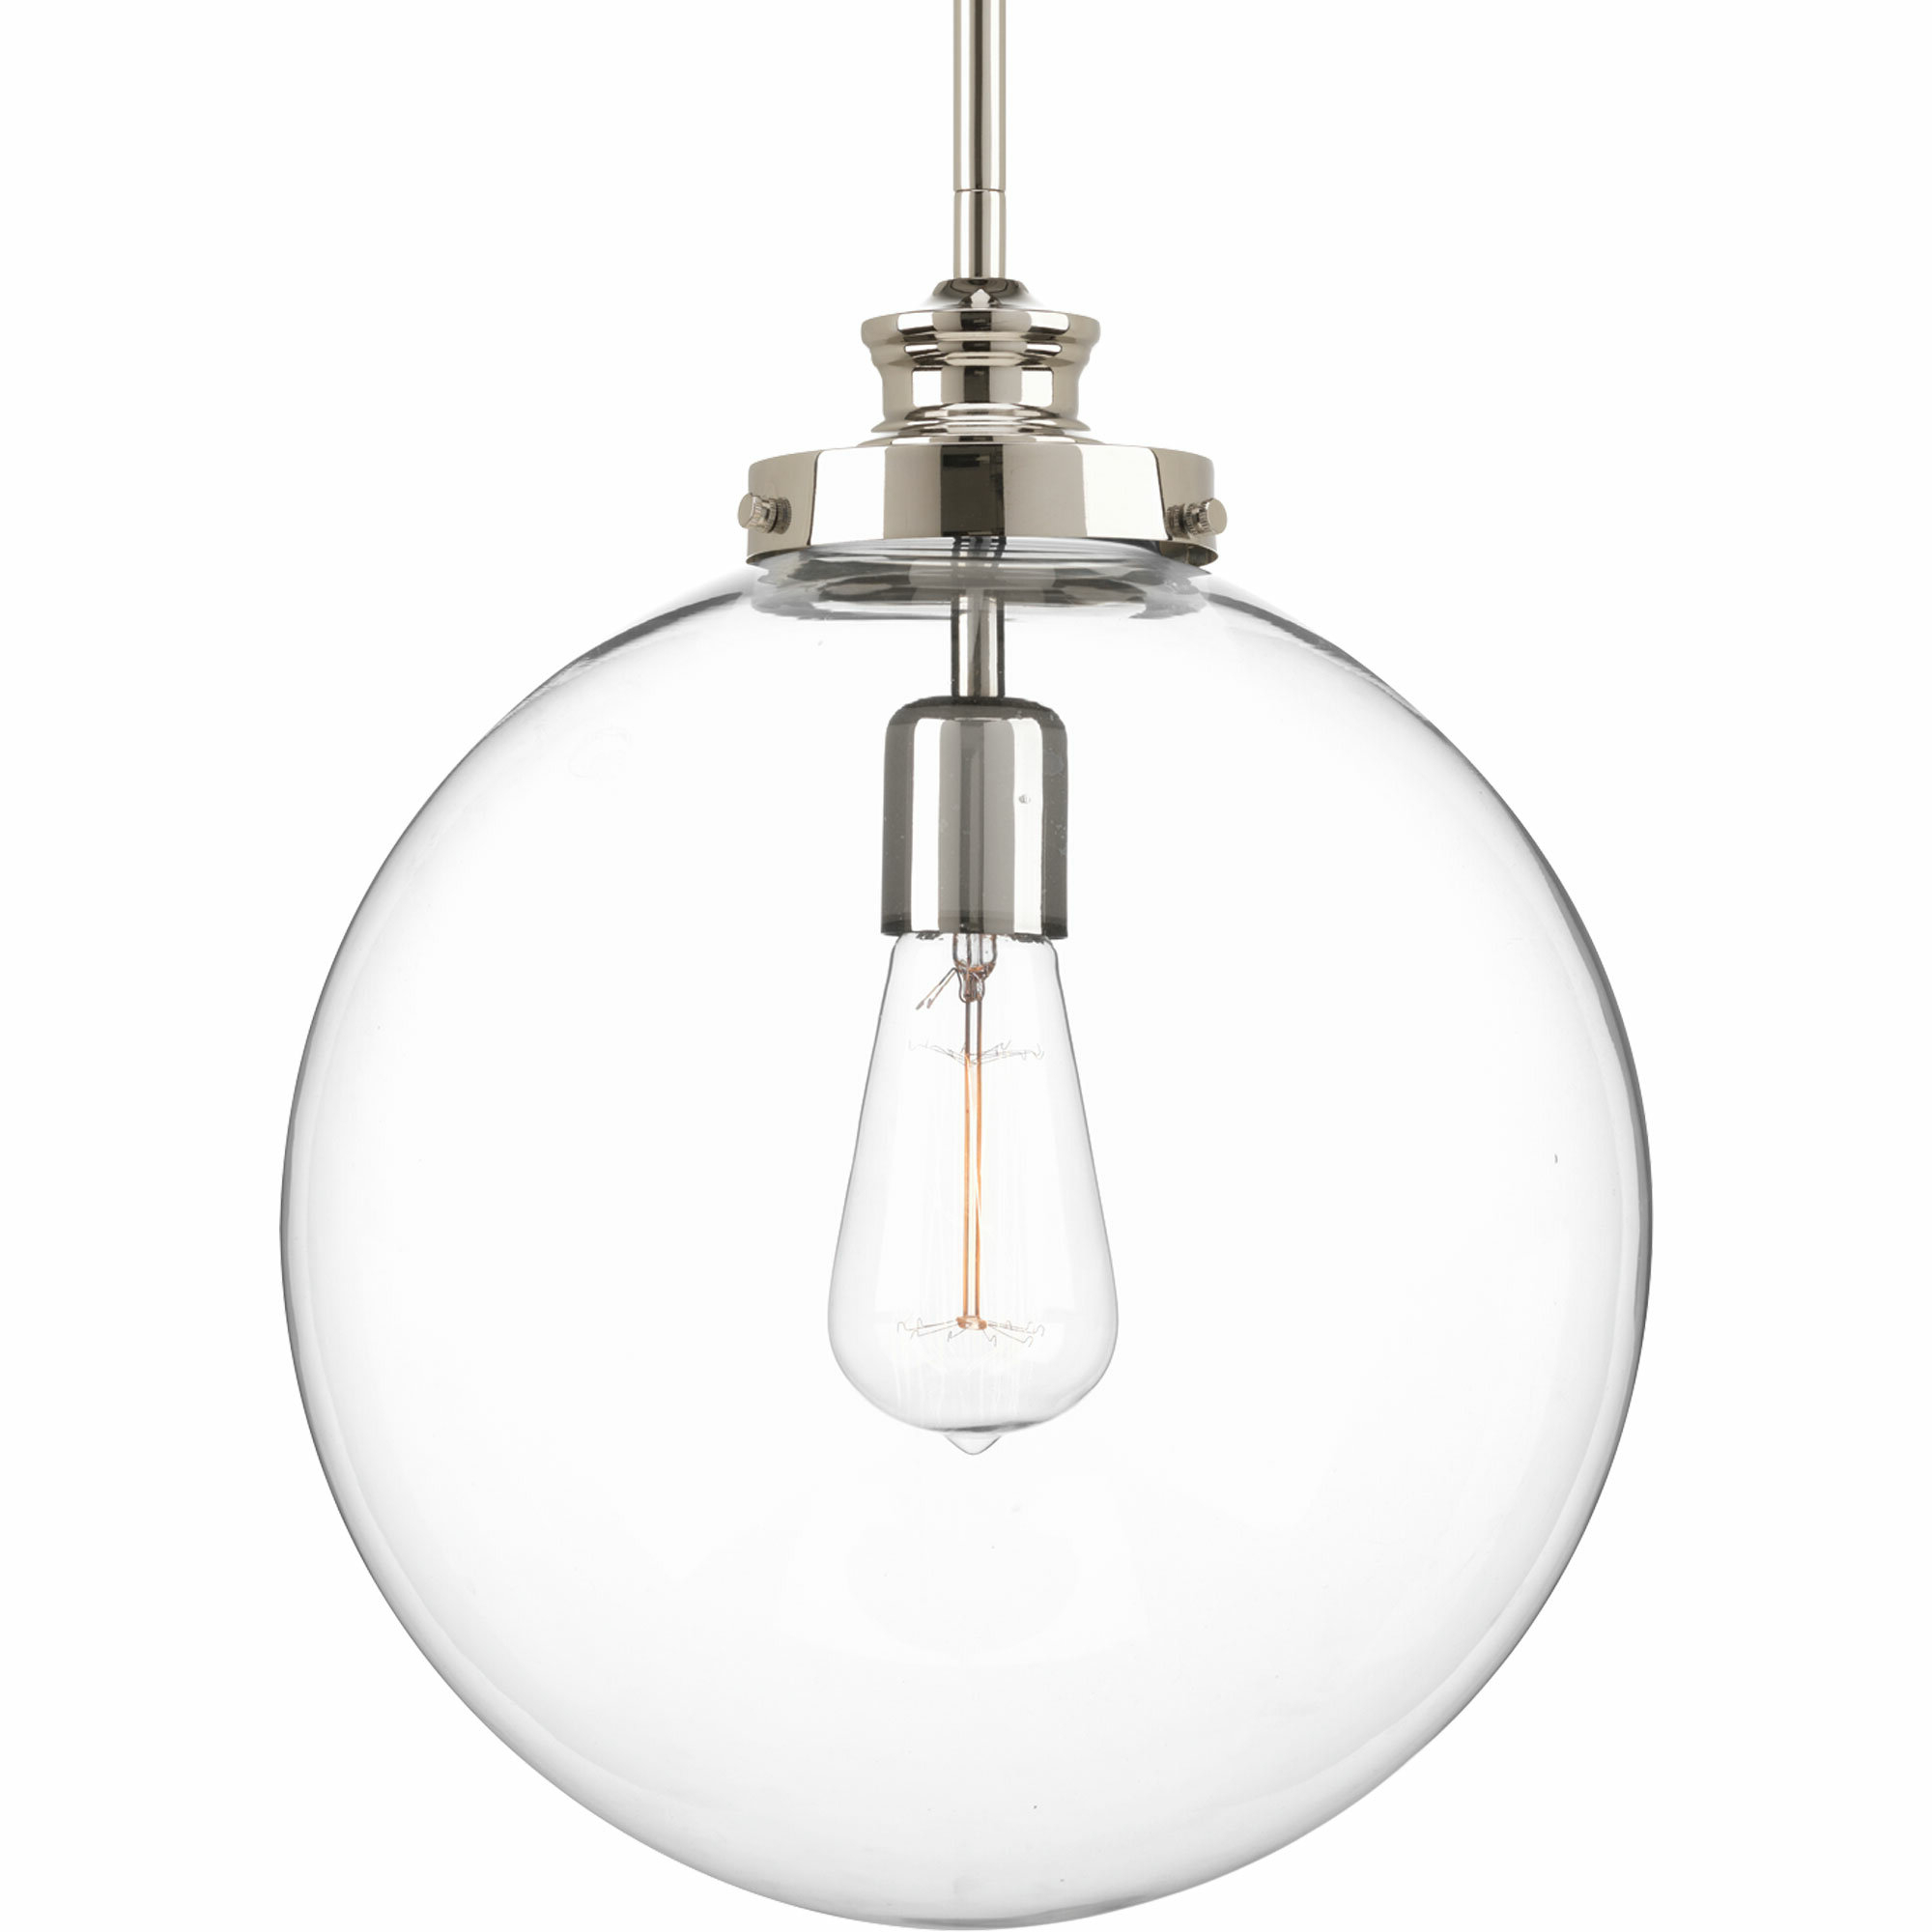 Betsy 1 Light Single Globe Pendants Regarding Trendy Cayden 1 Light Single Globe Pendant (View 4 of 20)